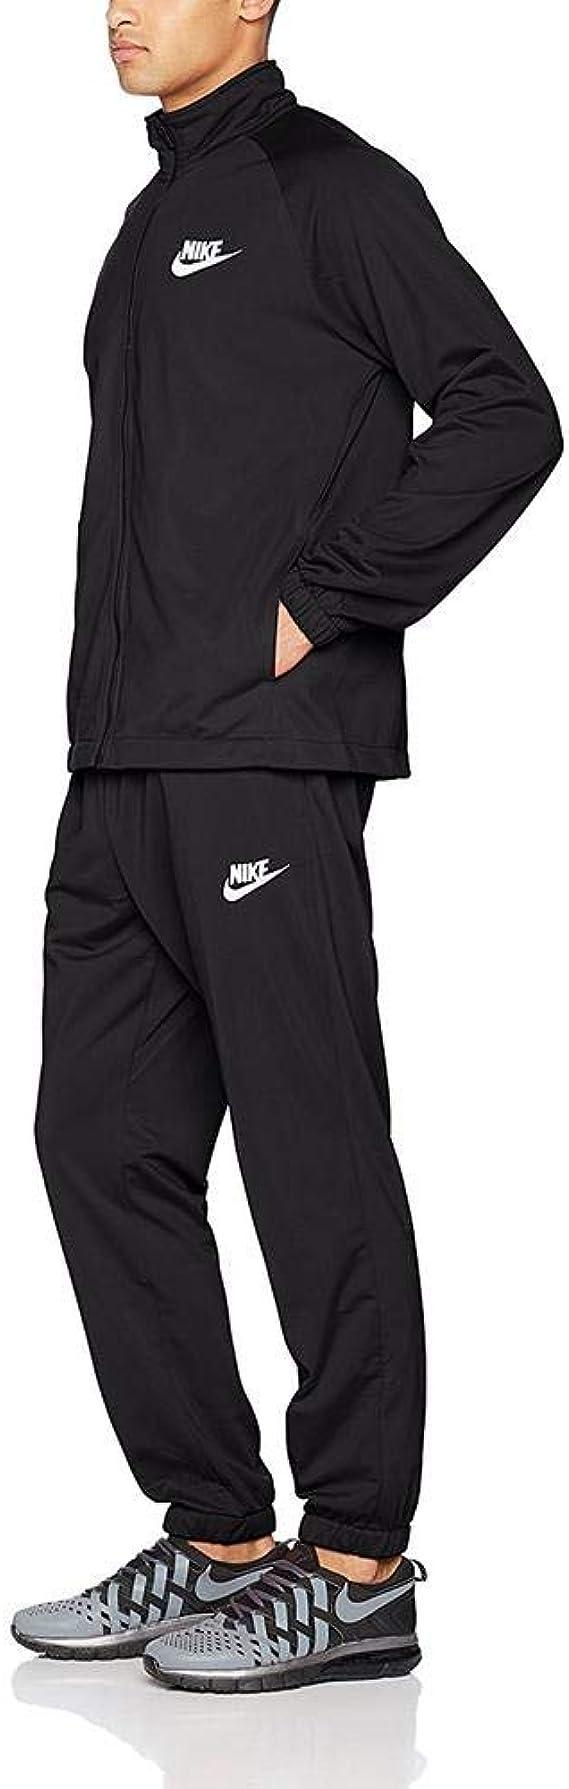 Nike M NSW TRK PK Basic Chándal, Hombre: Amazon.es: Ropa y accesorios